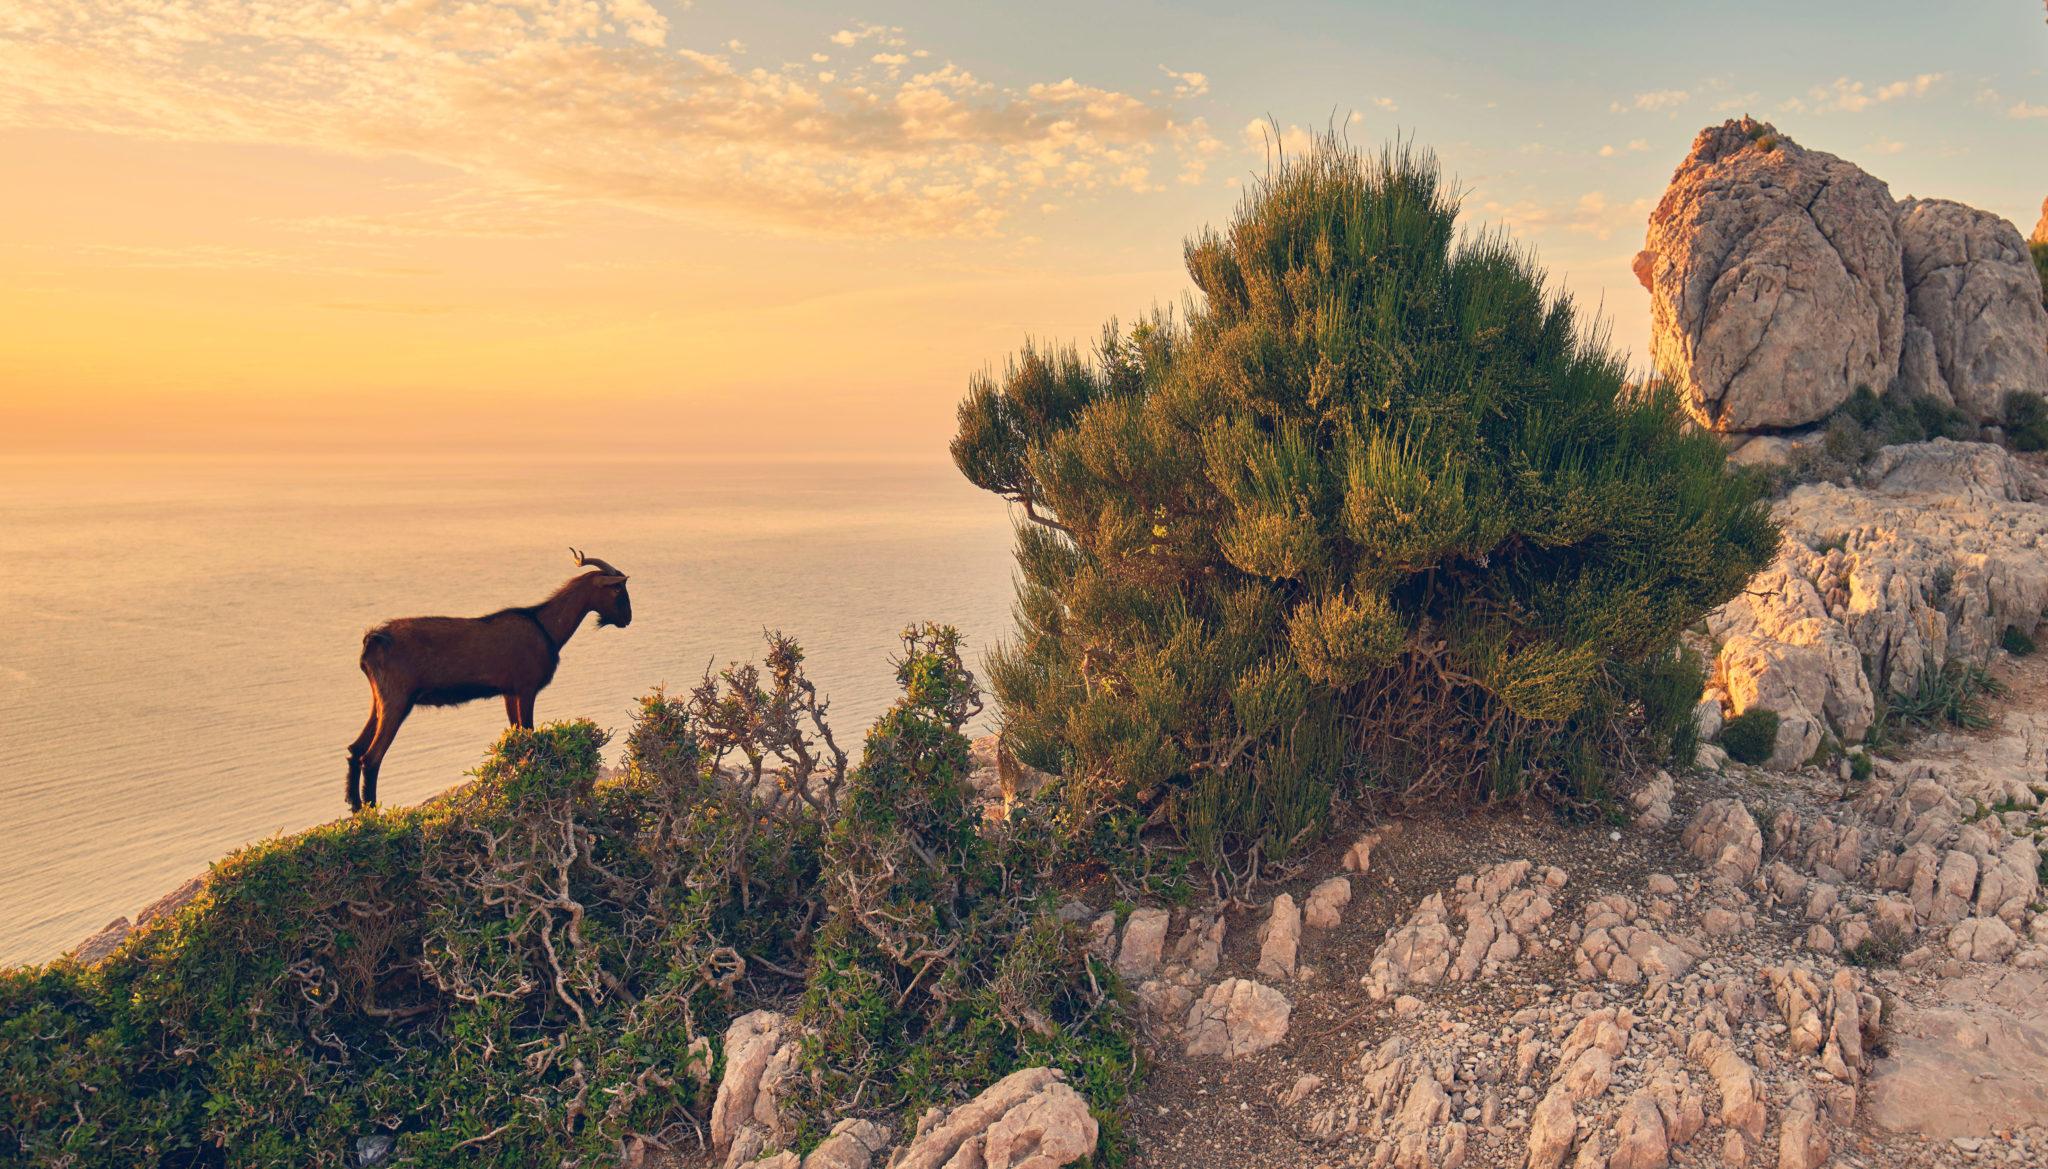 Wanderung im Sonnenuntergang auf Mallorca